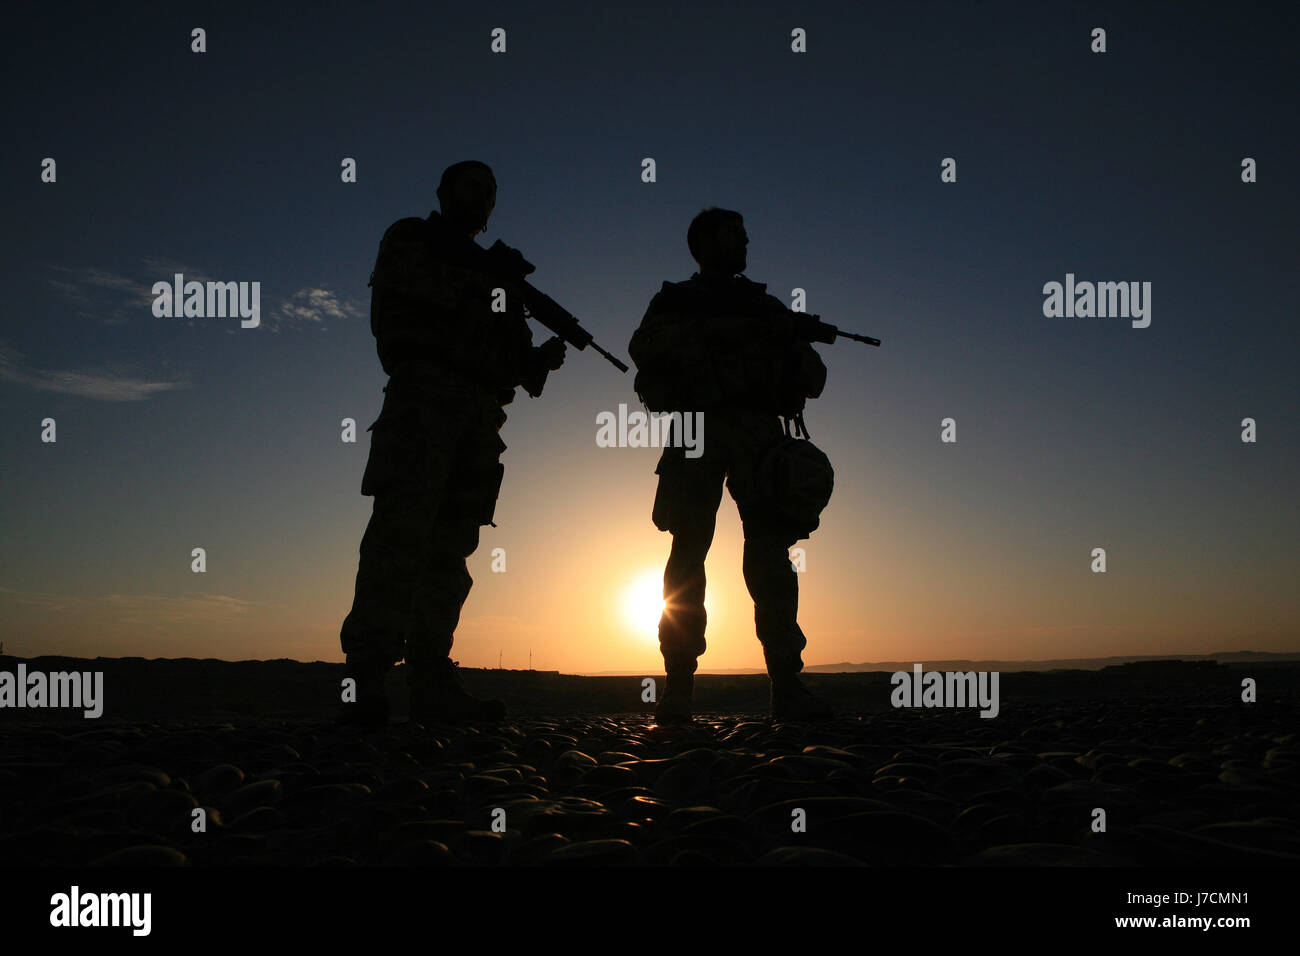 silhouette of a Royal Marine Commandos near Kala Bost Fort 2km south of Lashkah Gar, Helmand Province, Afghanistan - Stock Image